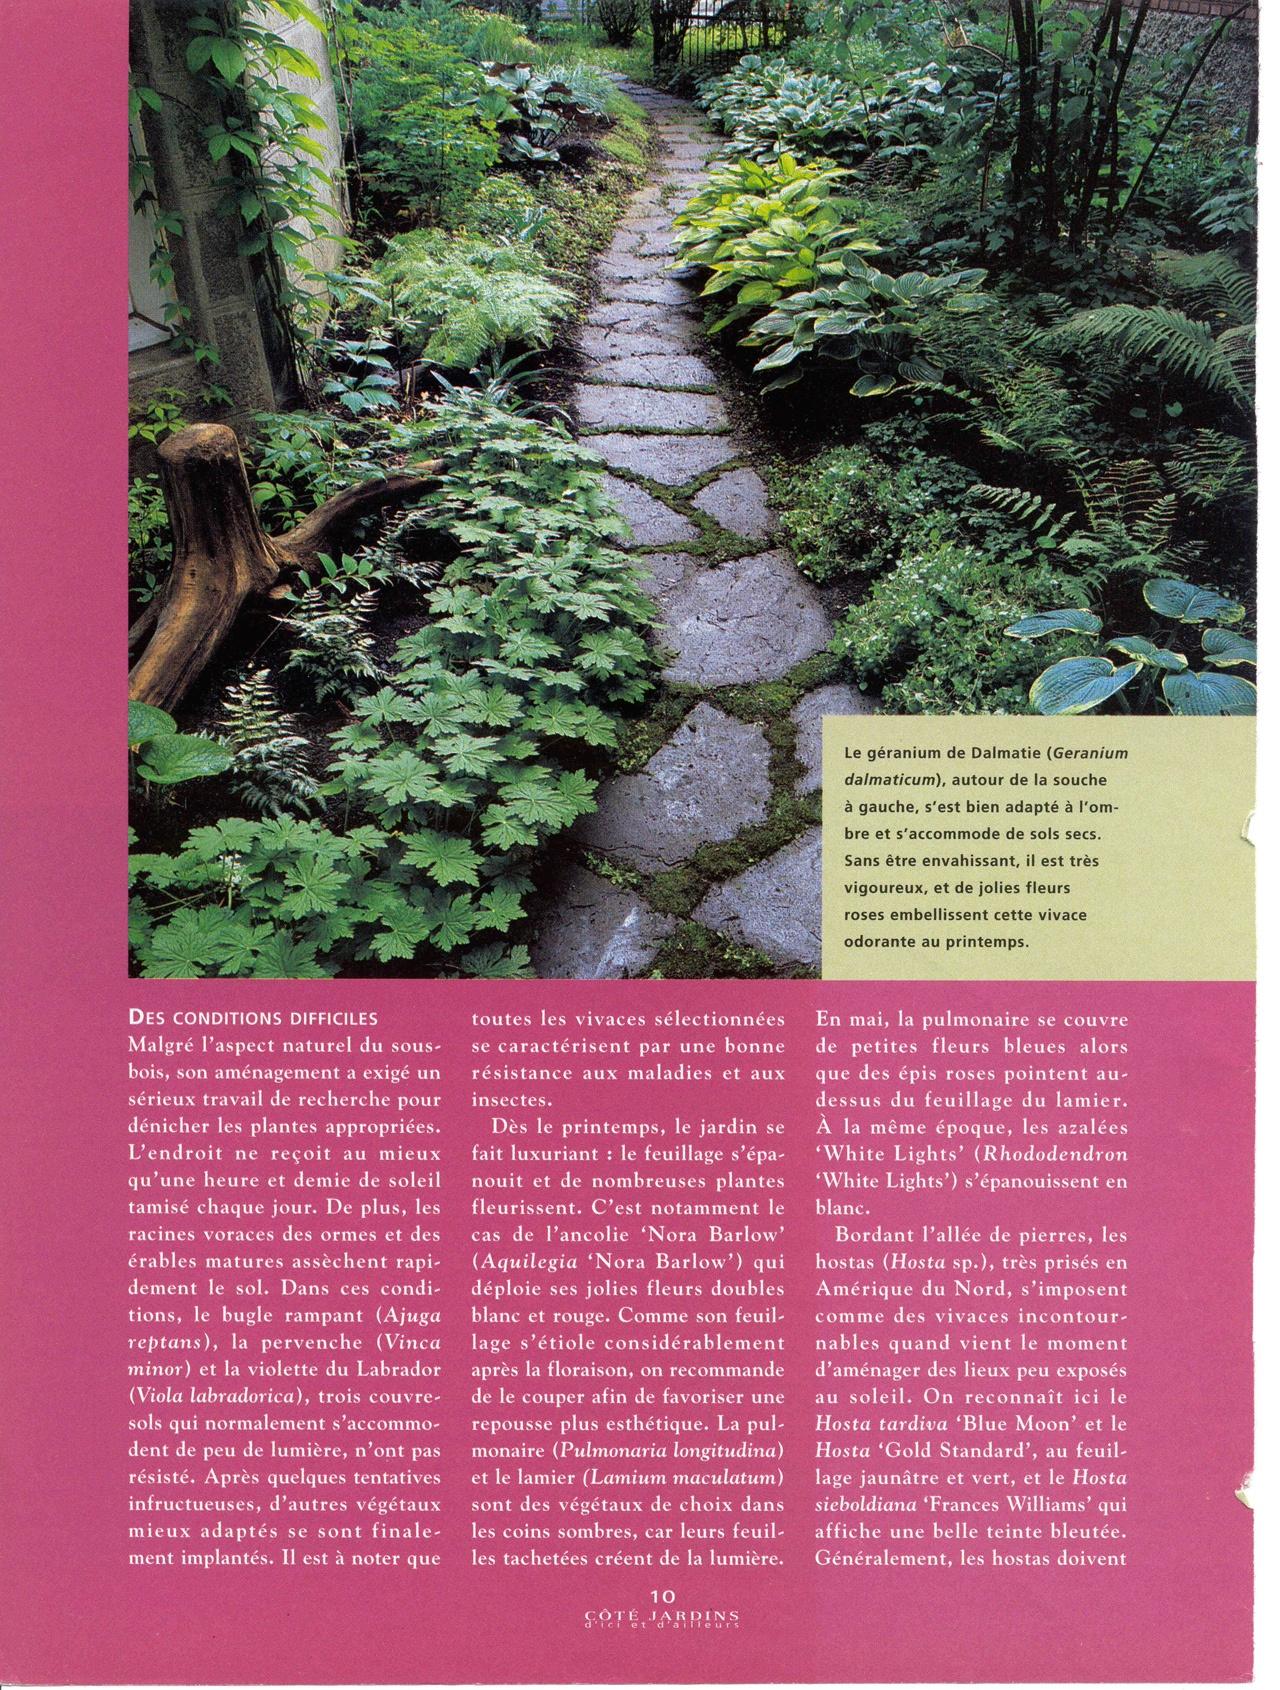 Allée verdoyante, Coté Jardins no 3, automne 1998